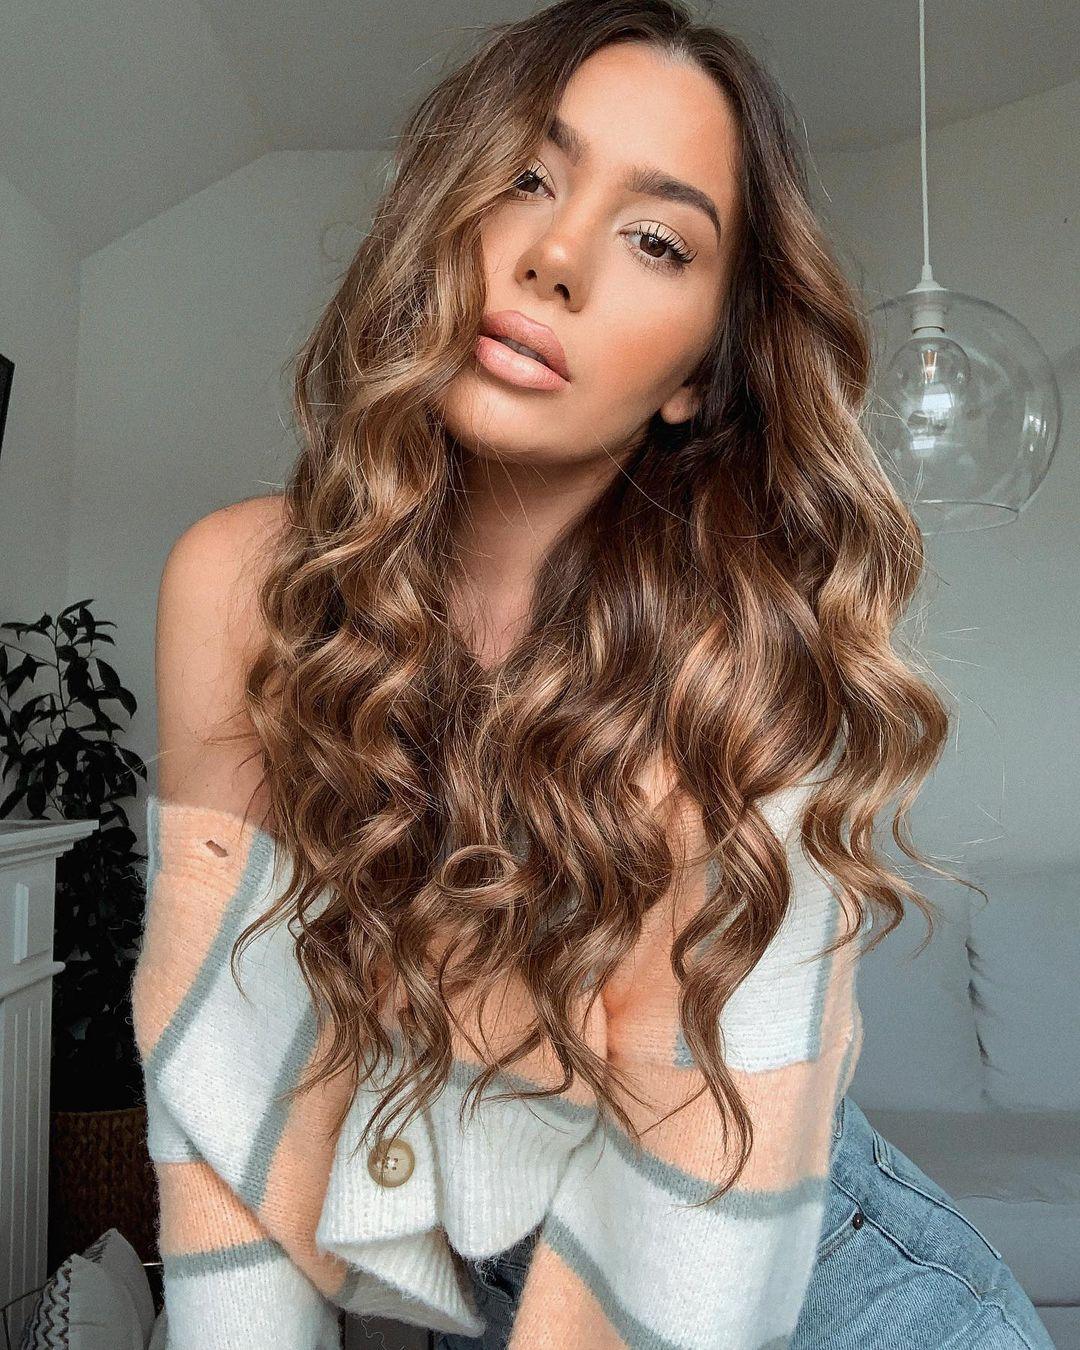 Jelena-Peric-Wallpapers-Insta-Fit-Bio-11